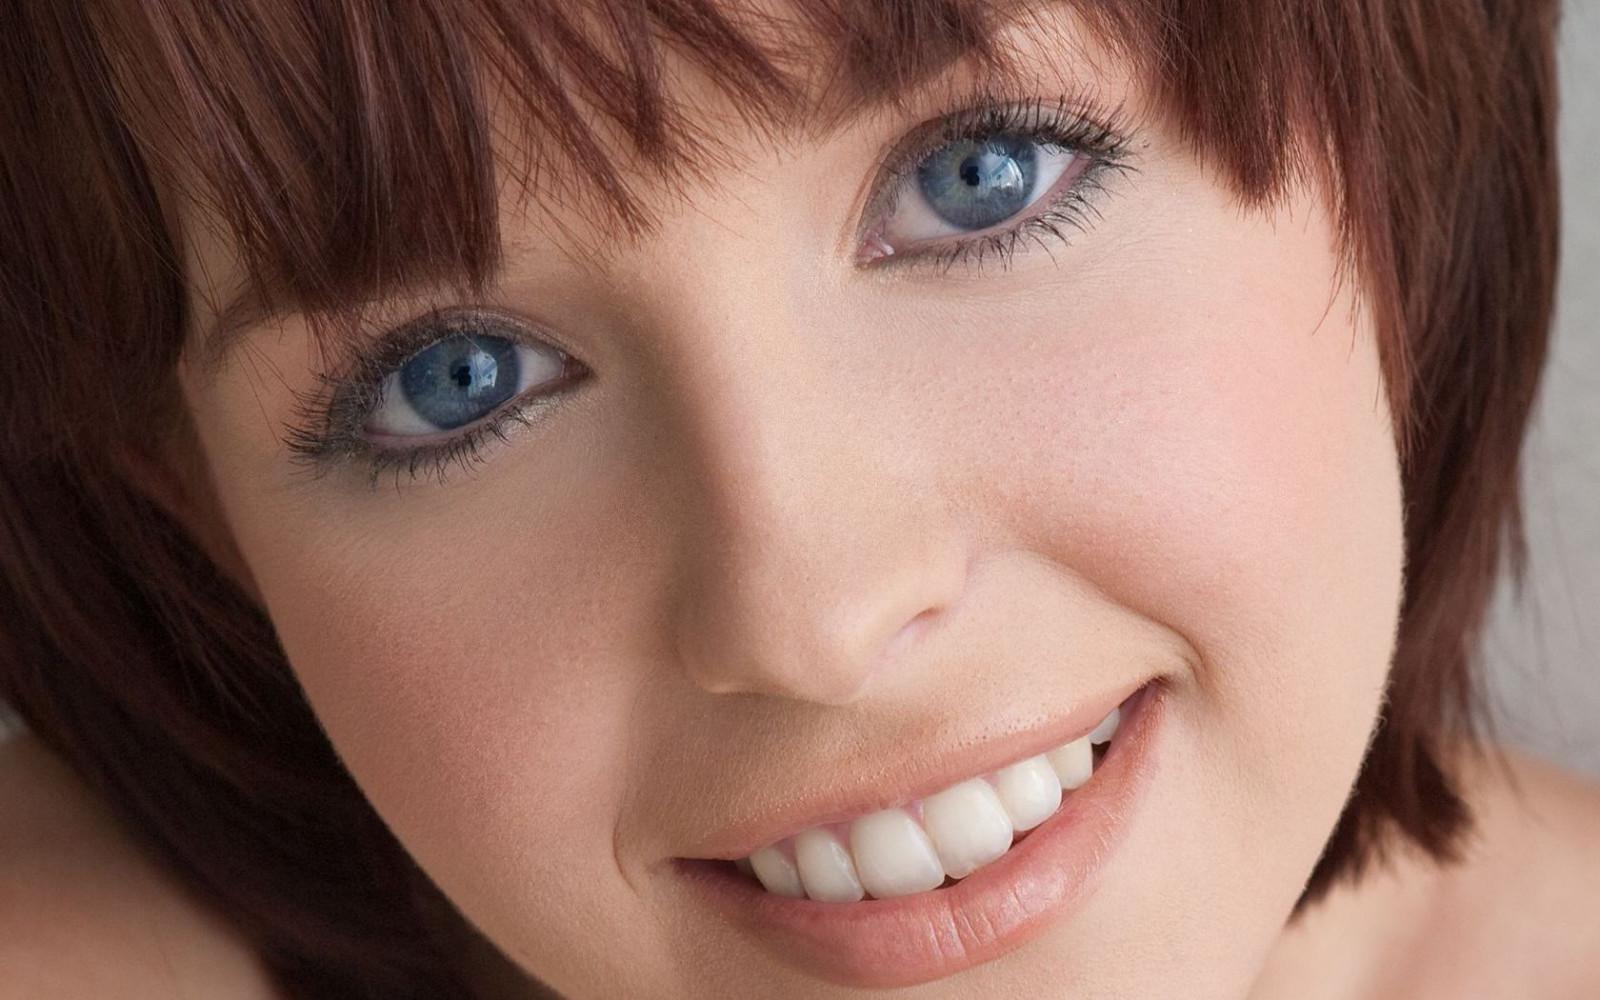 Sfondi : 1680x1050 px, frangia, occhi blu, avvicinamento ...